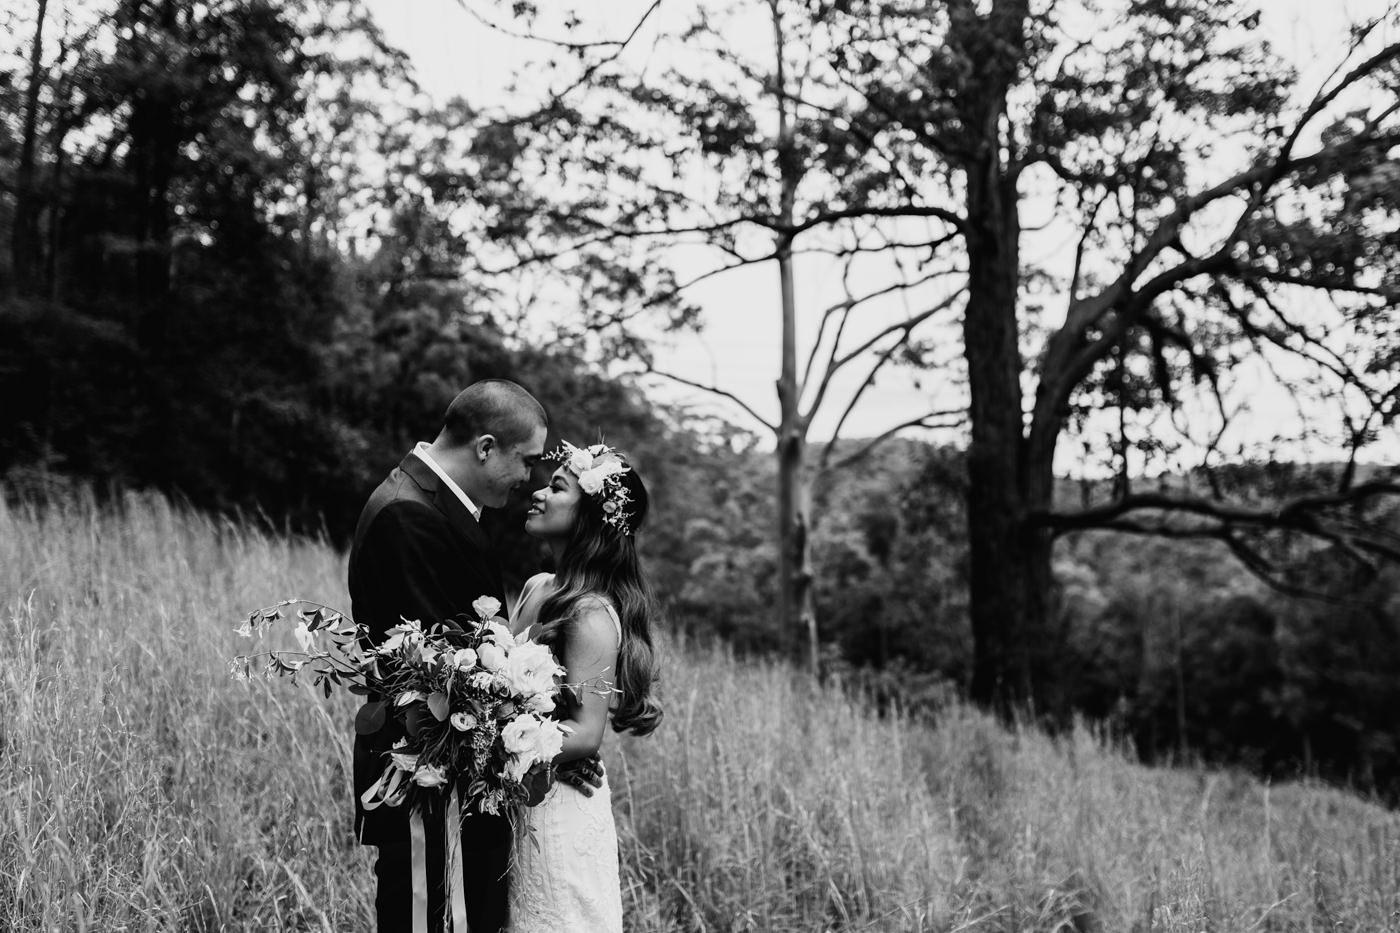 Nick & Vanezza - Fernbank Farm Wedding - Samantha Heather Photography-107.jpg